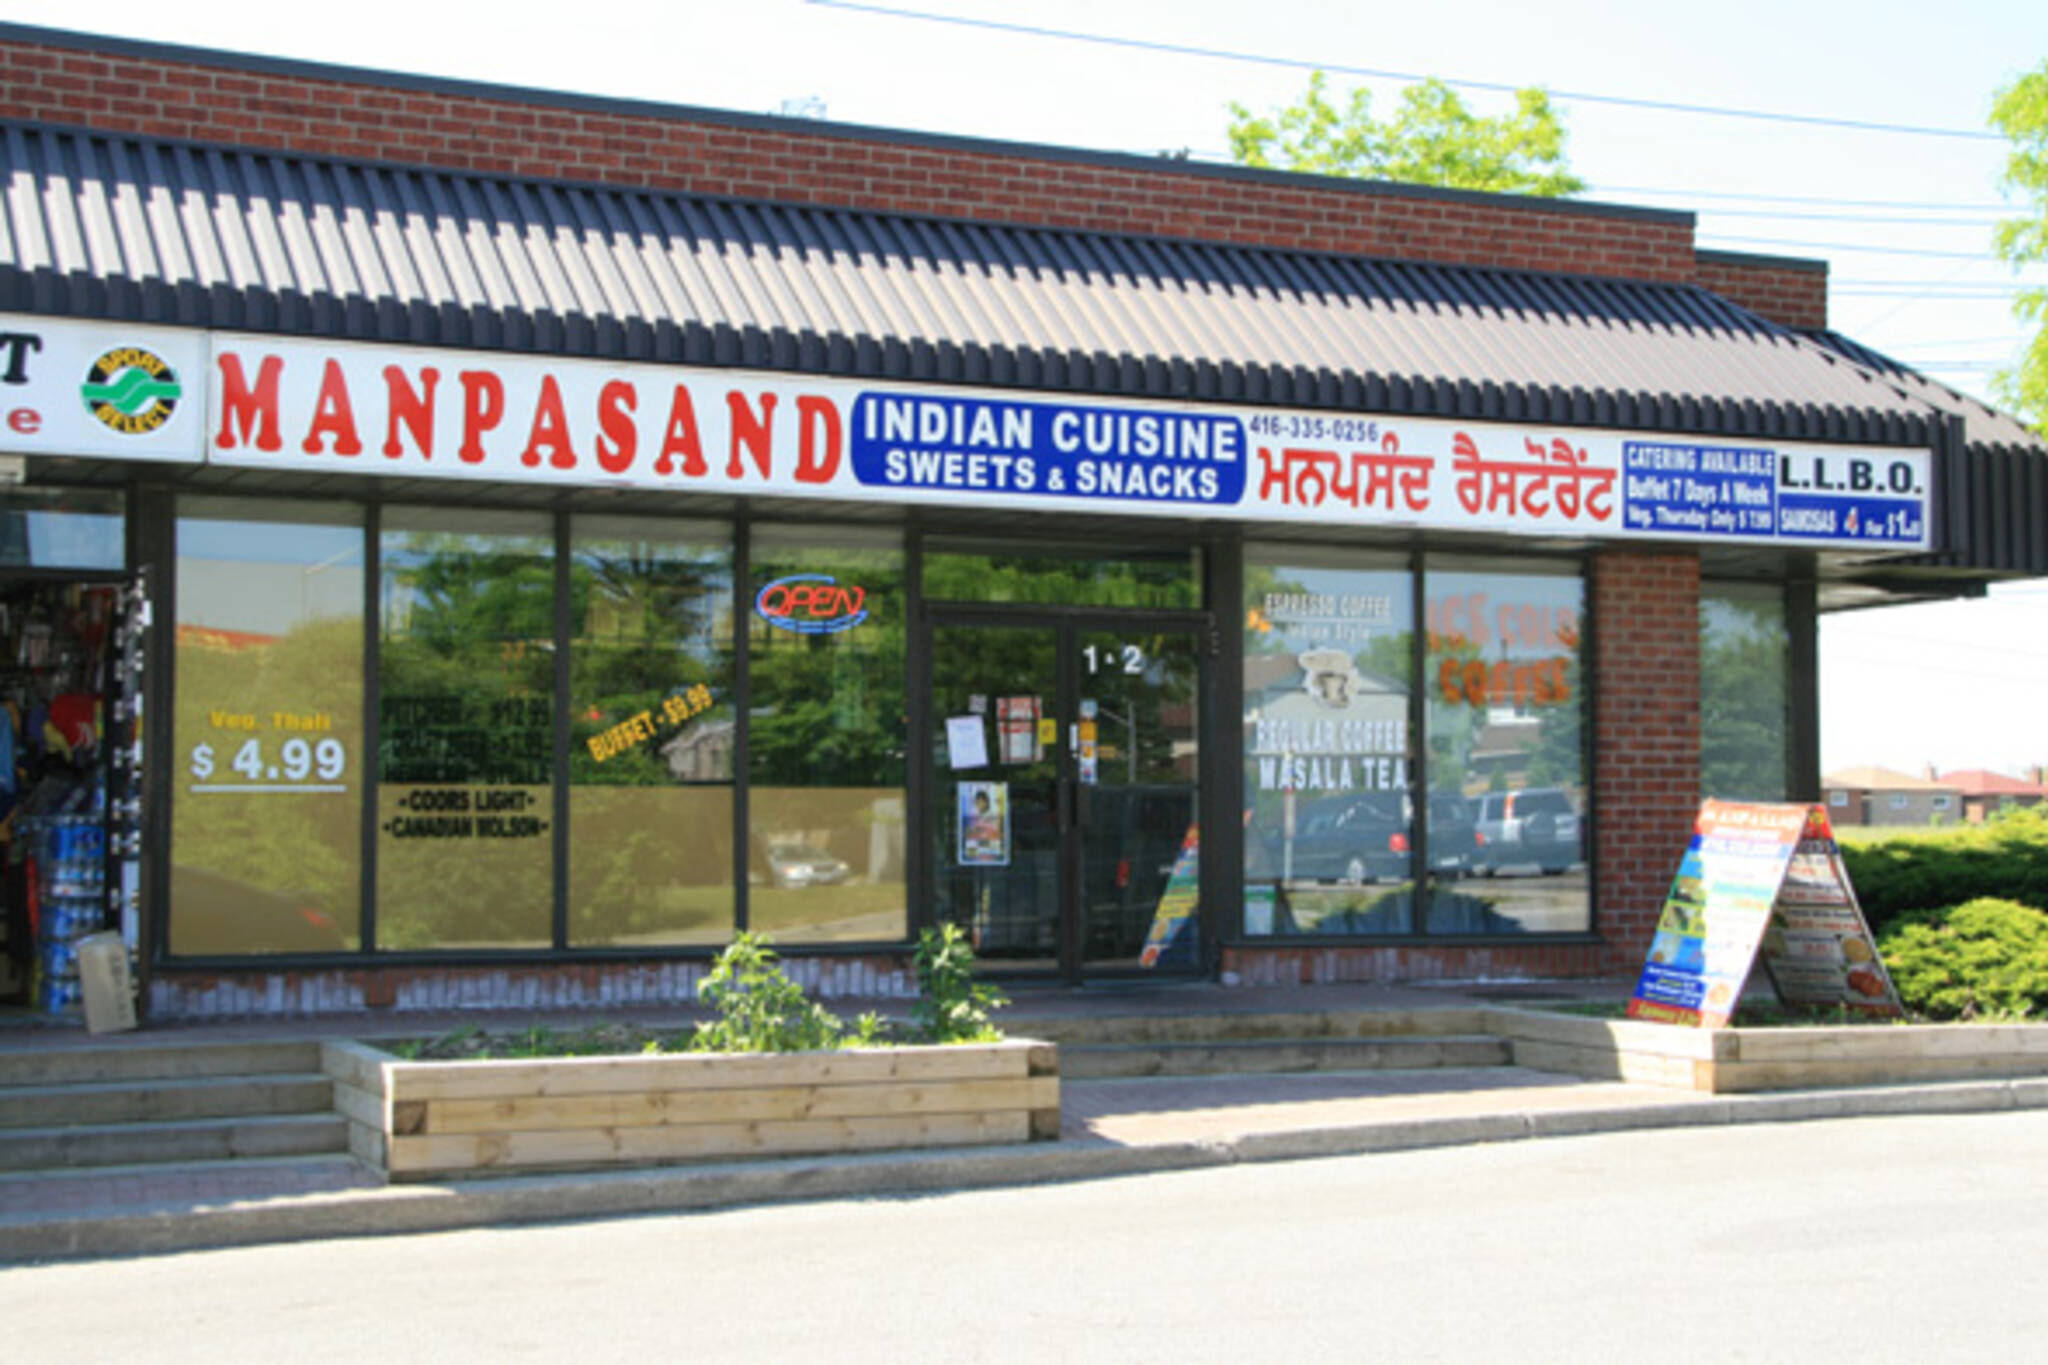 Manpasand Indian Cuisine